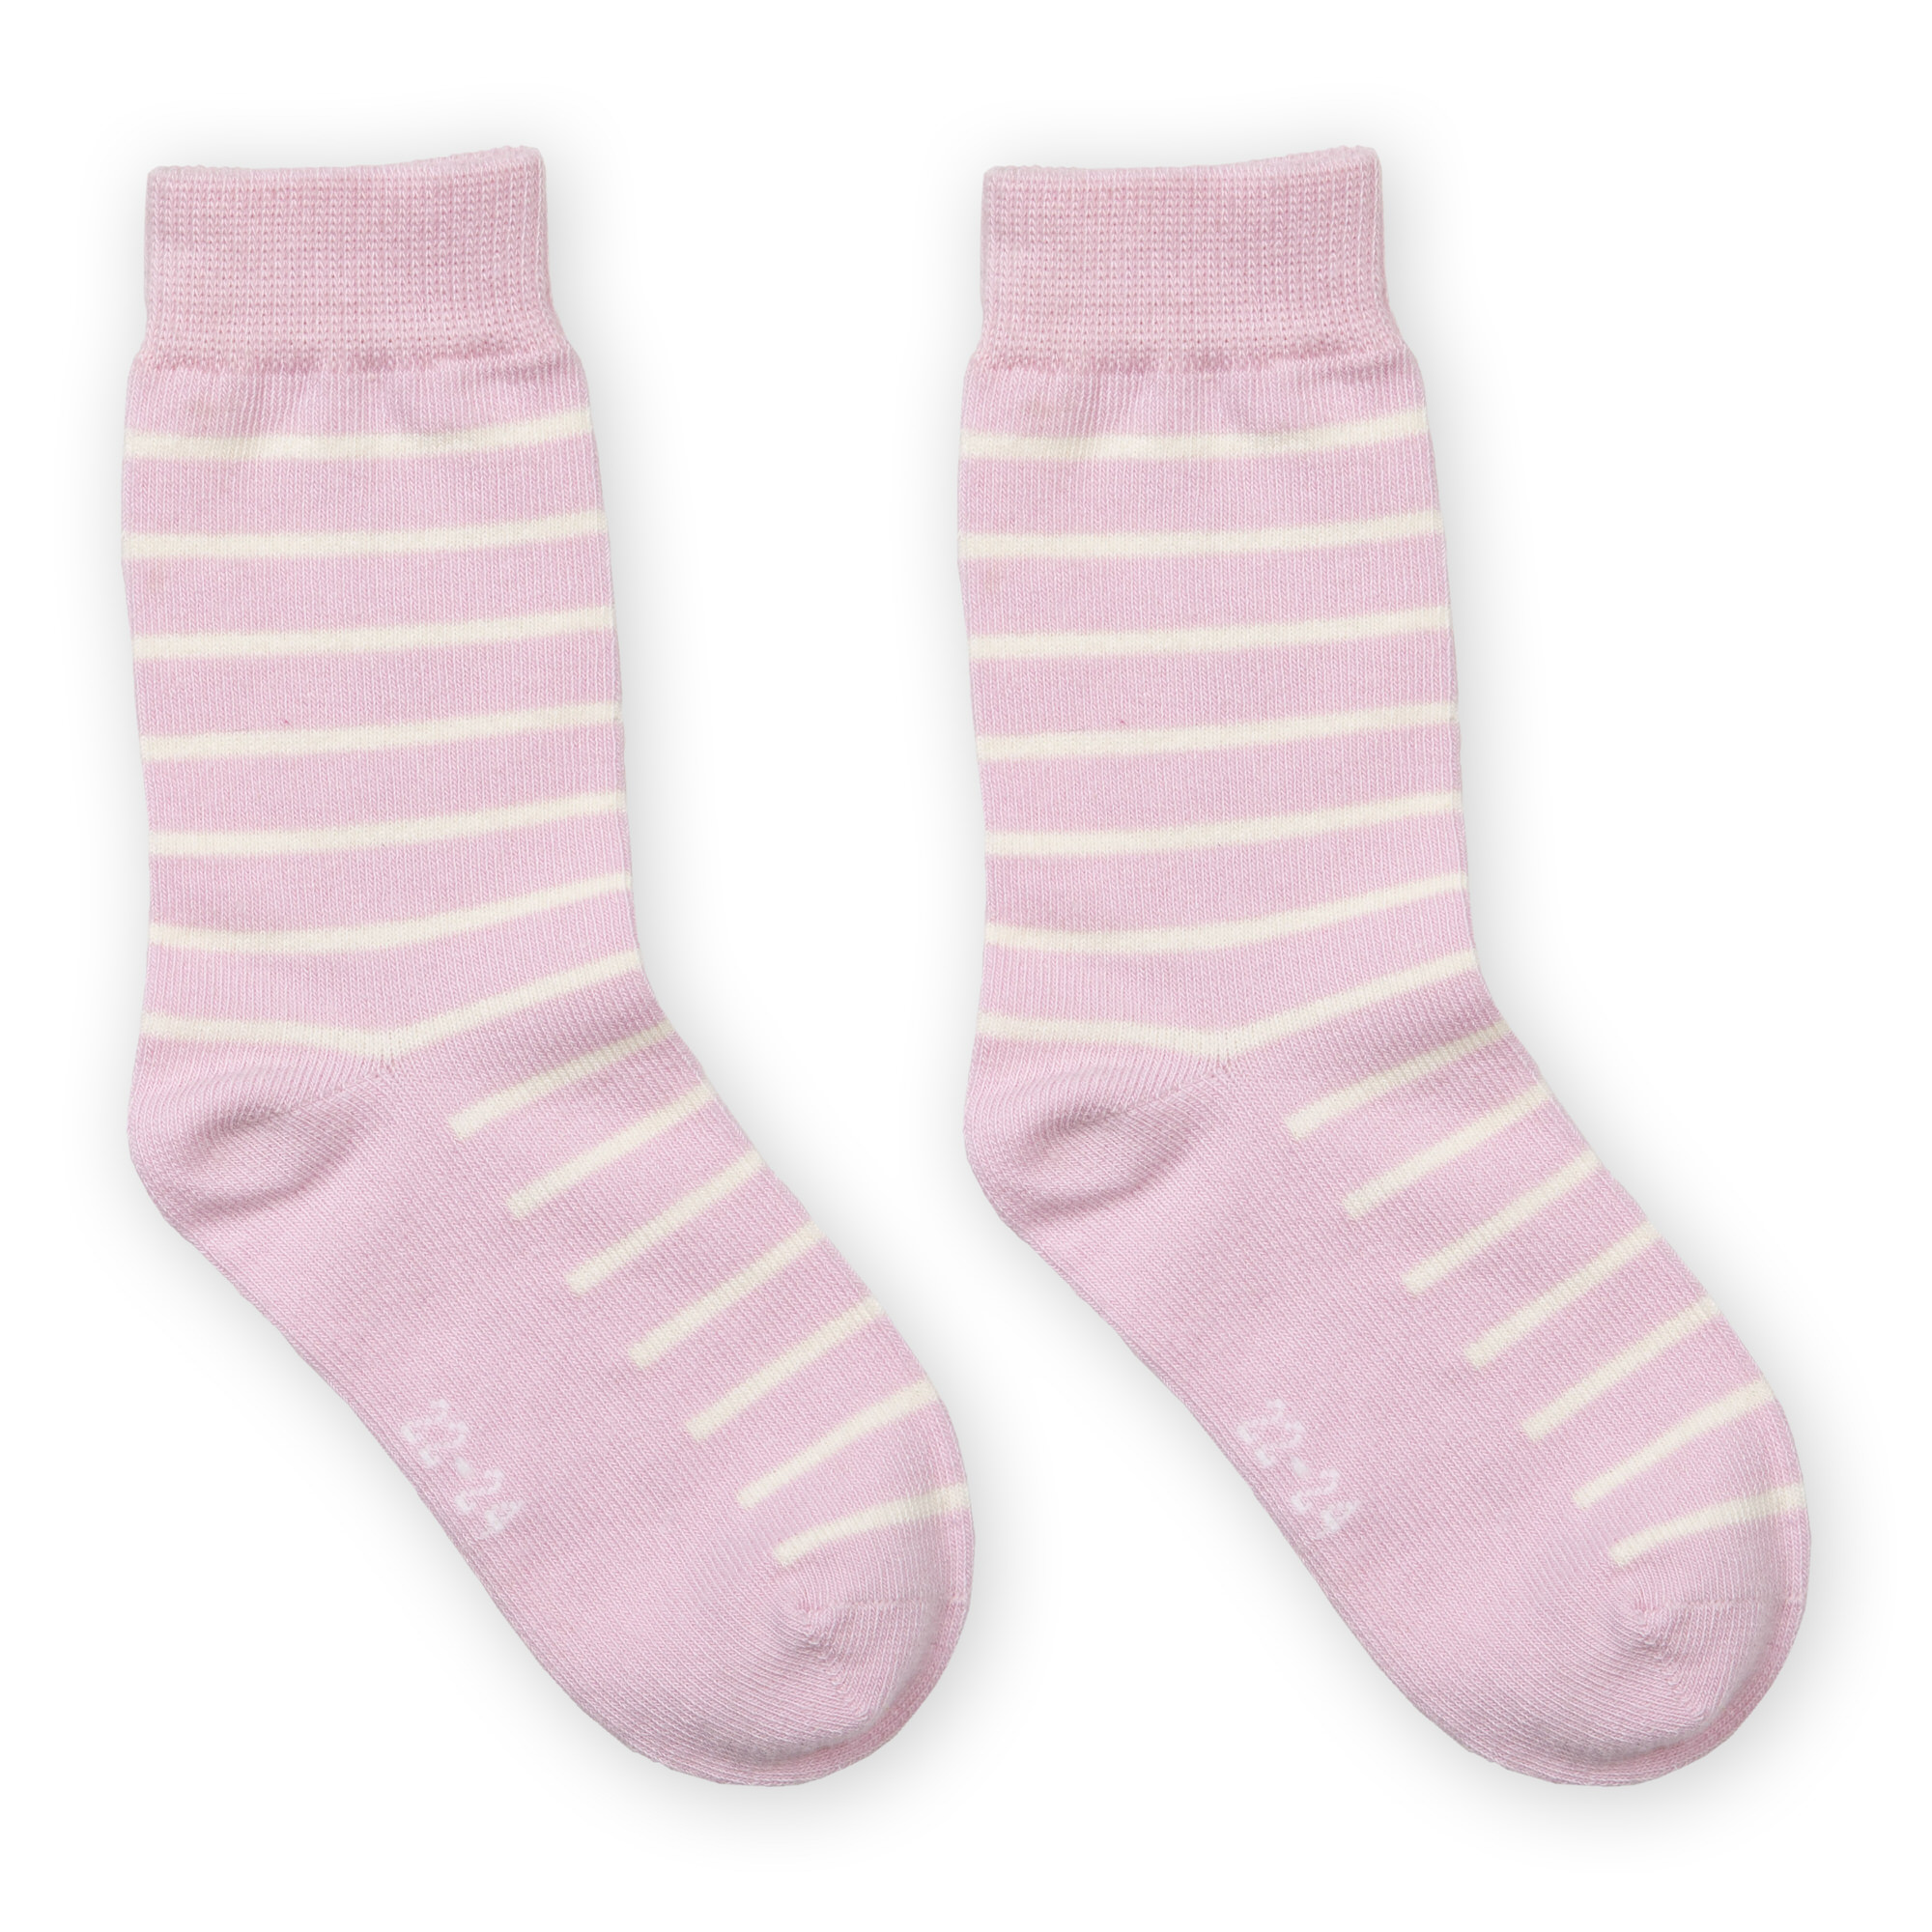 90267dac4317f4 Mädchen Ringelsocken rosa